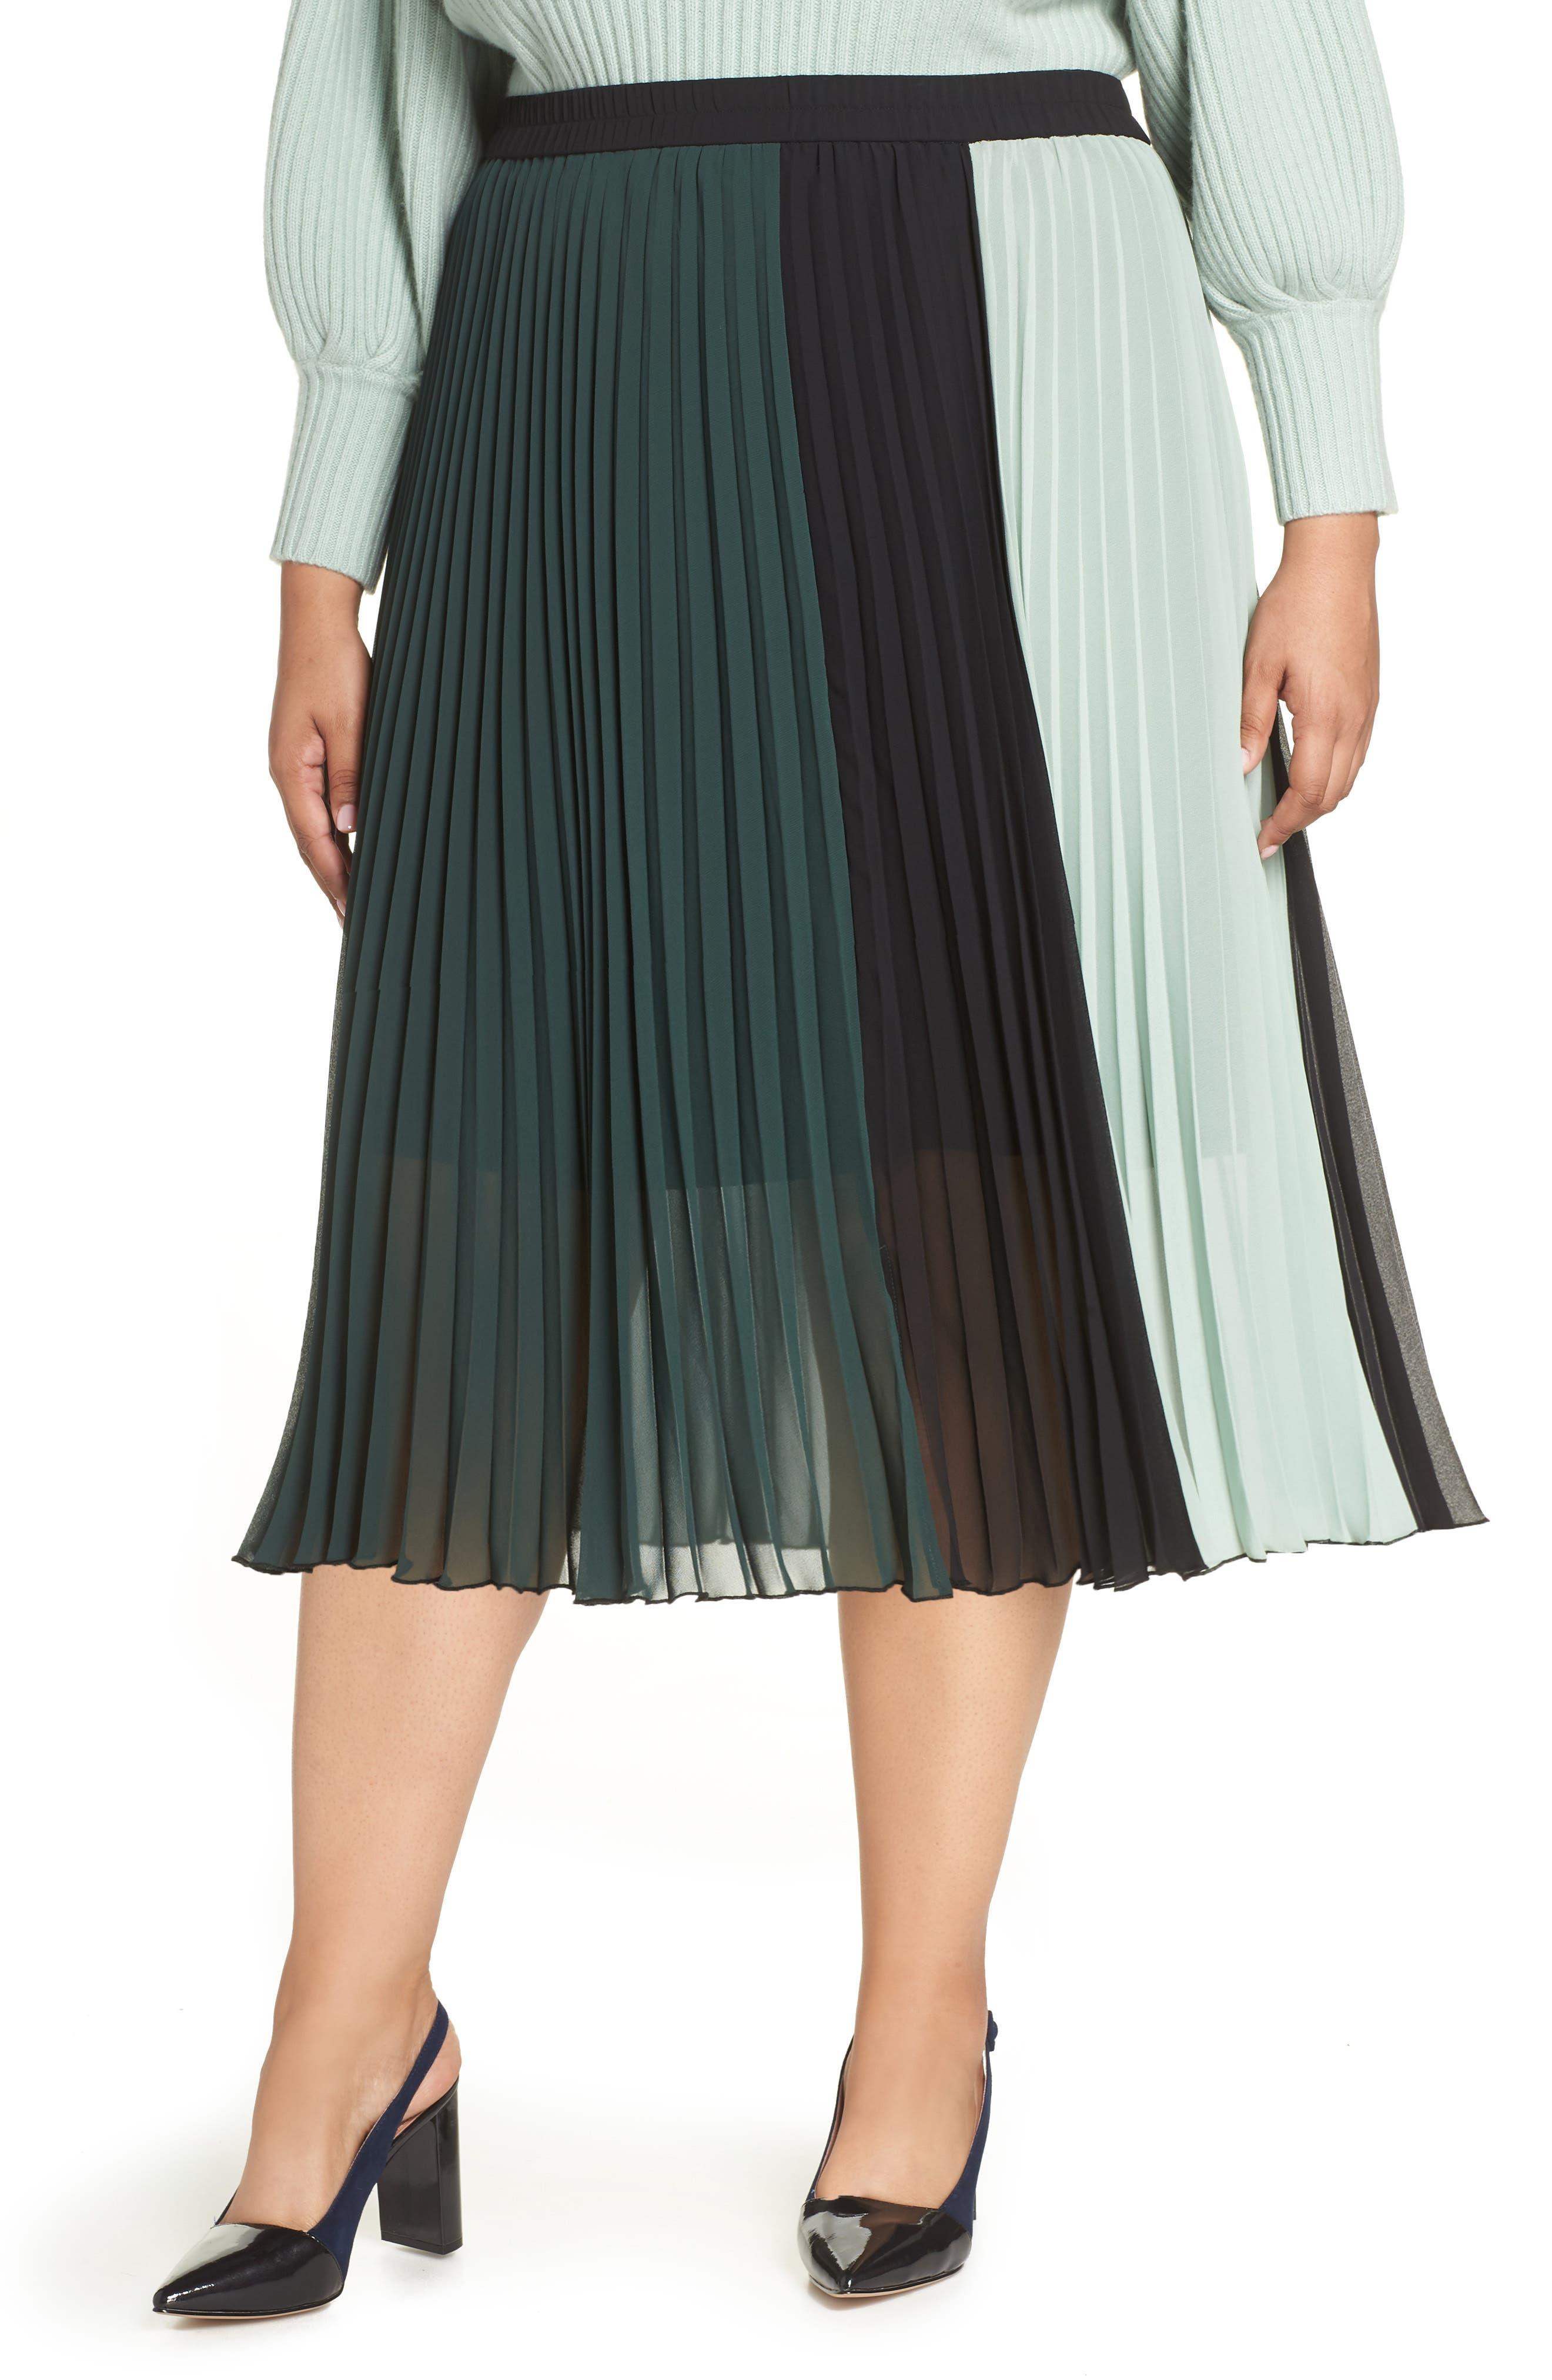 x Atlantic-Pacific Colorblock Pleated Midi Skirt,                             Main thumbnail 1, color,                             GREEN- BLACK COLORBLOCK